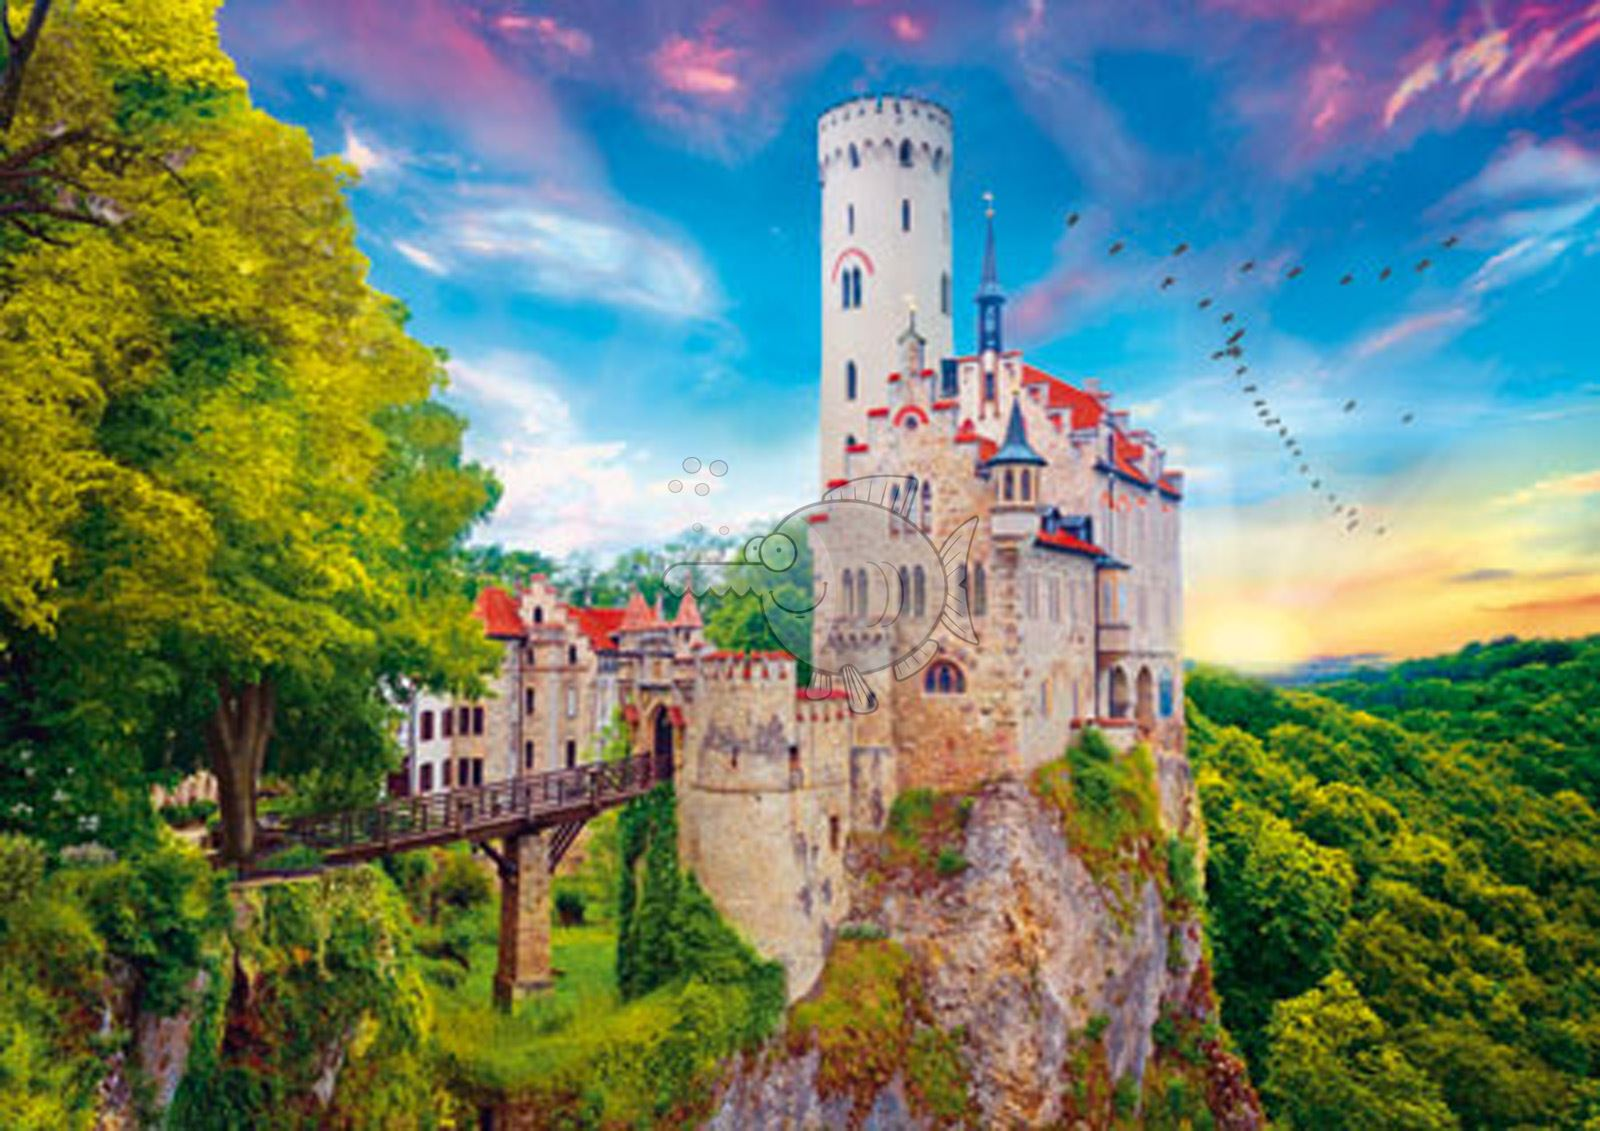 Trefl-300-500-1000-1500-2000-3000-4000-6000-Piece-Jigsaw-Puzzle-Landscapes-City thumbnail 182